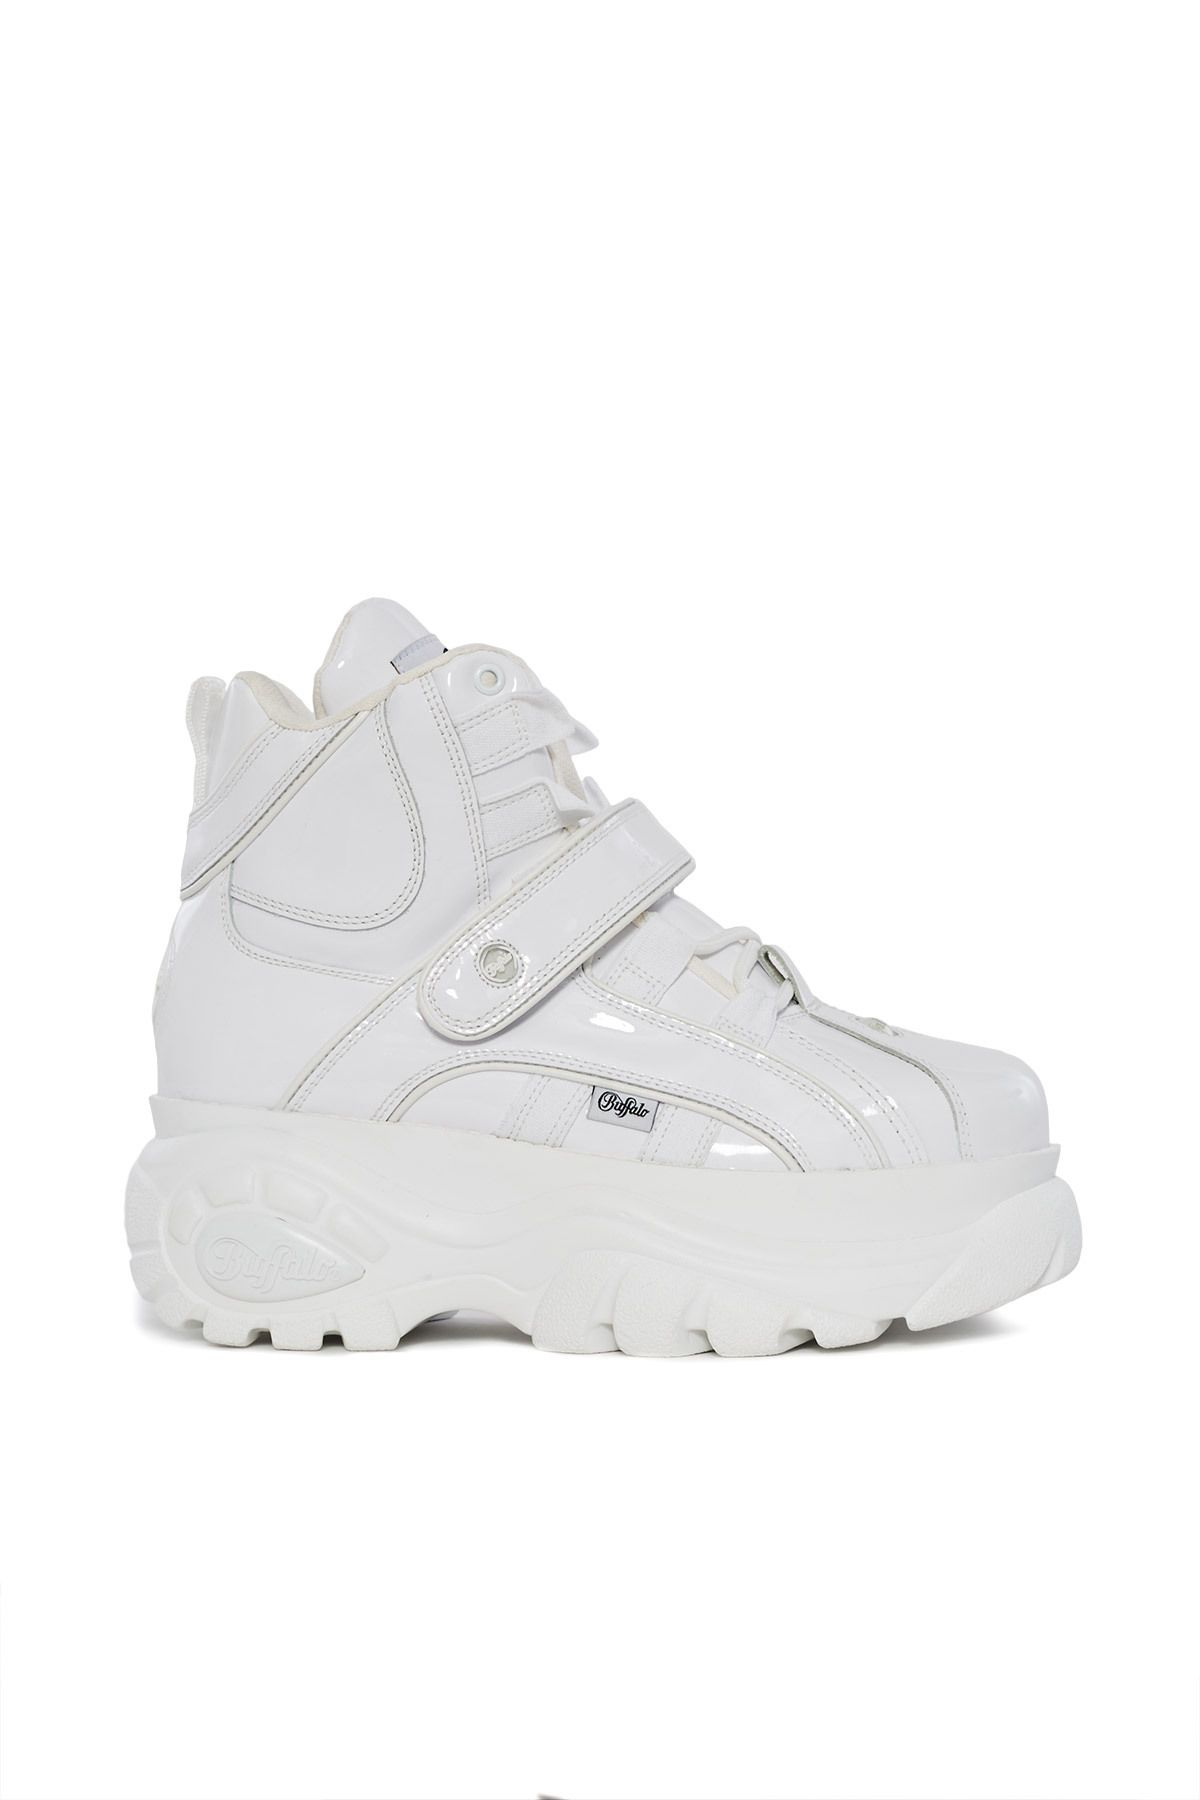 Platform LondonCharol Sneaker A Buffalo High Top Favorite Blanco kuOwZTPXi